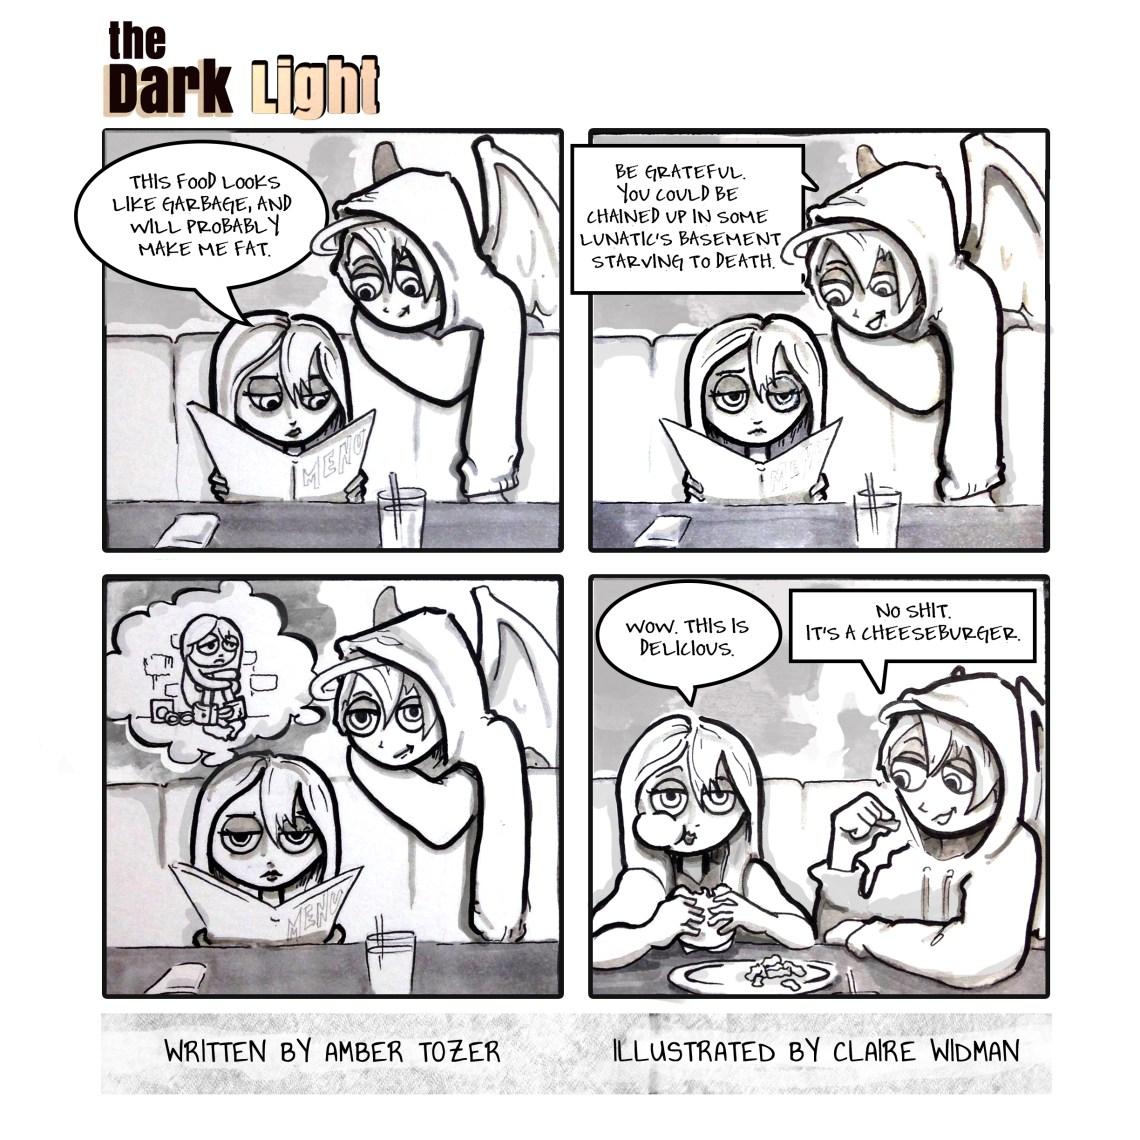 DarkLight_Comic_1